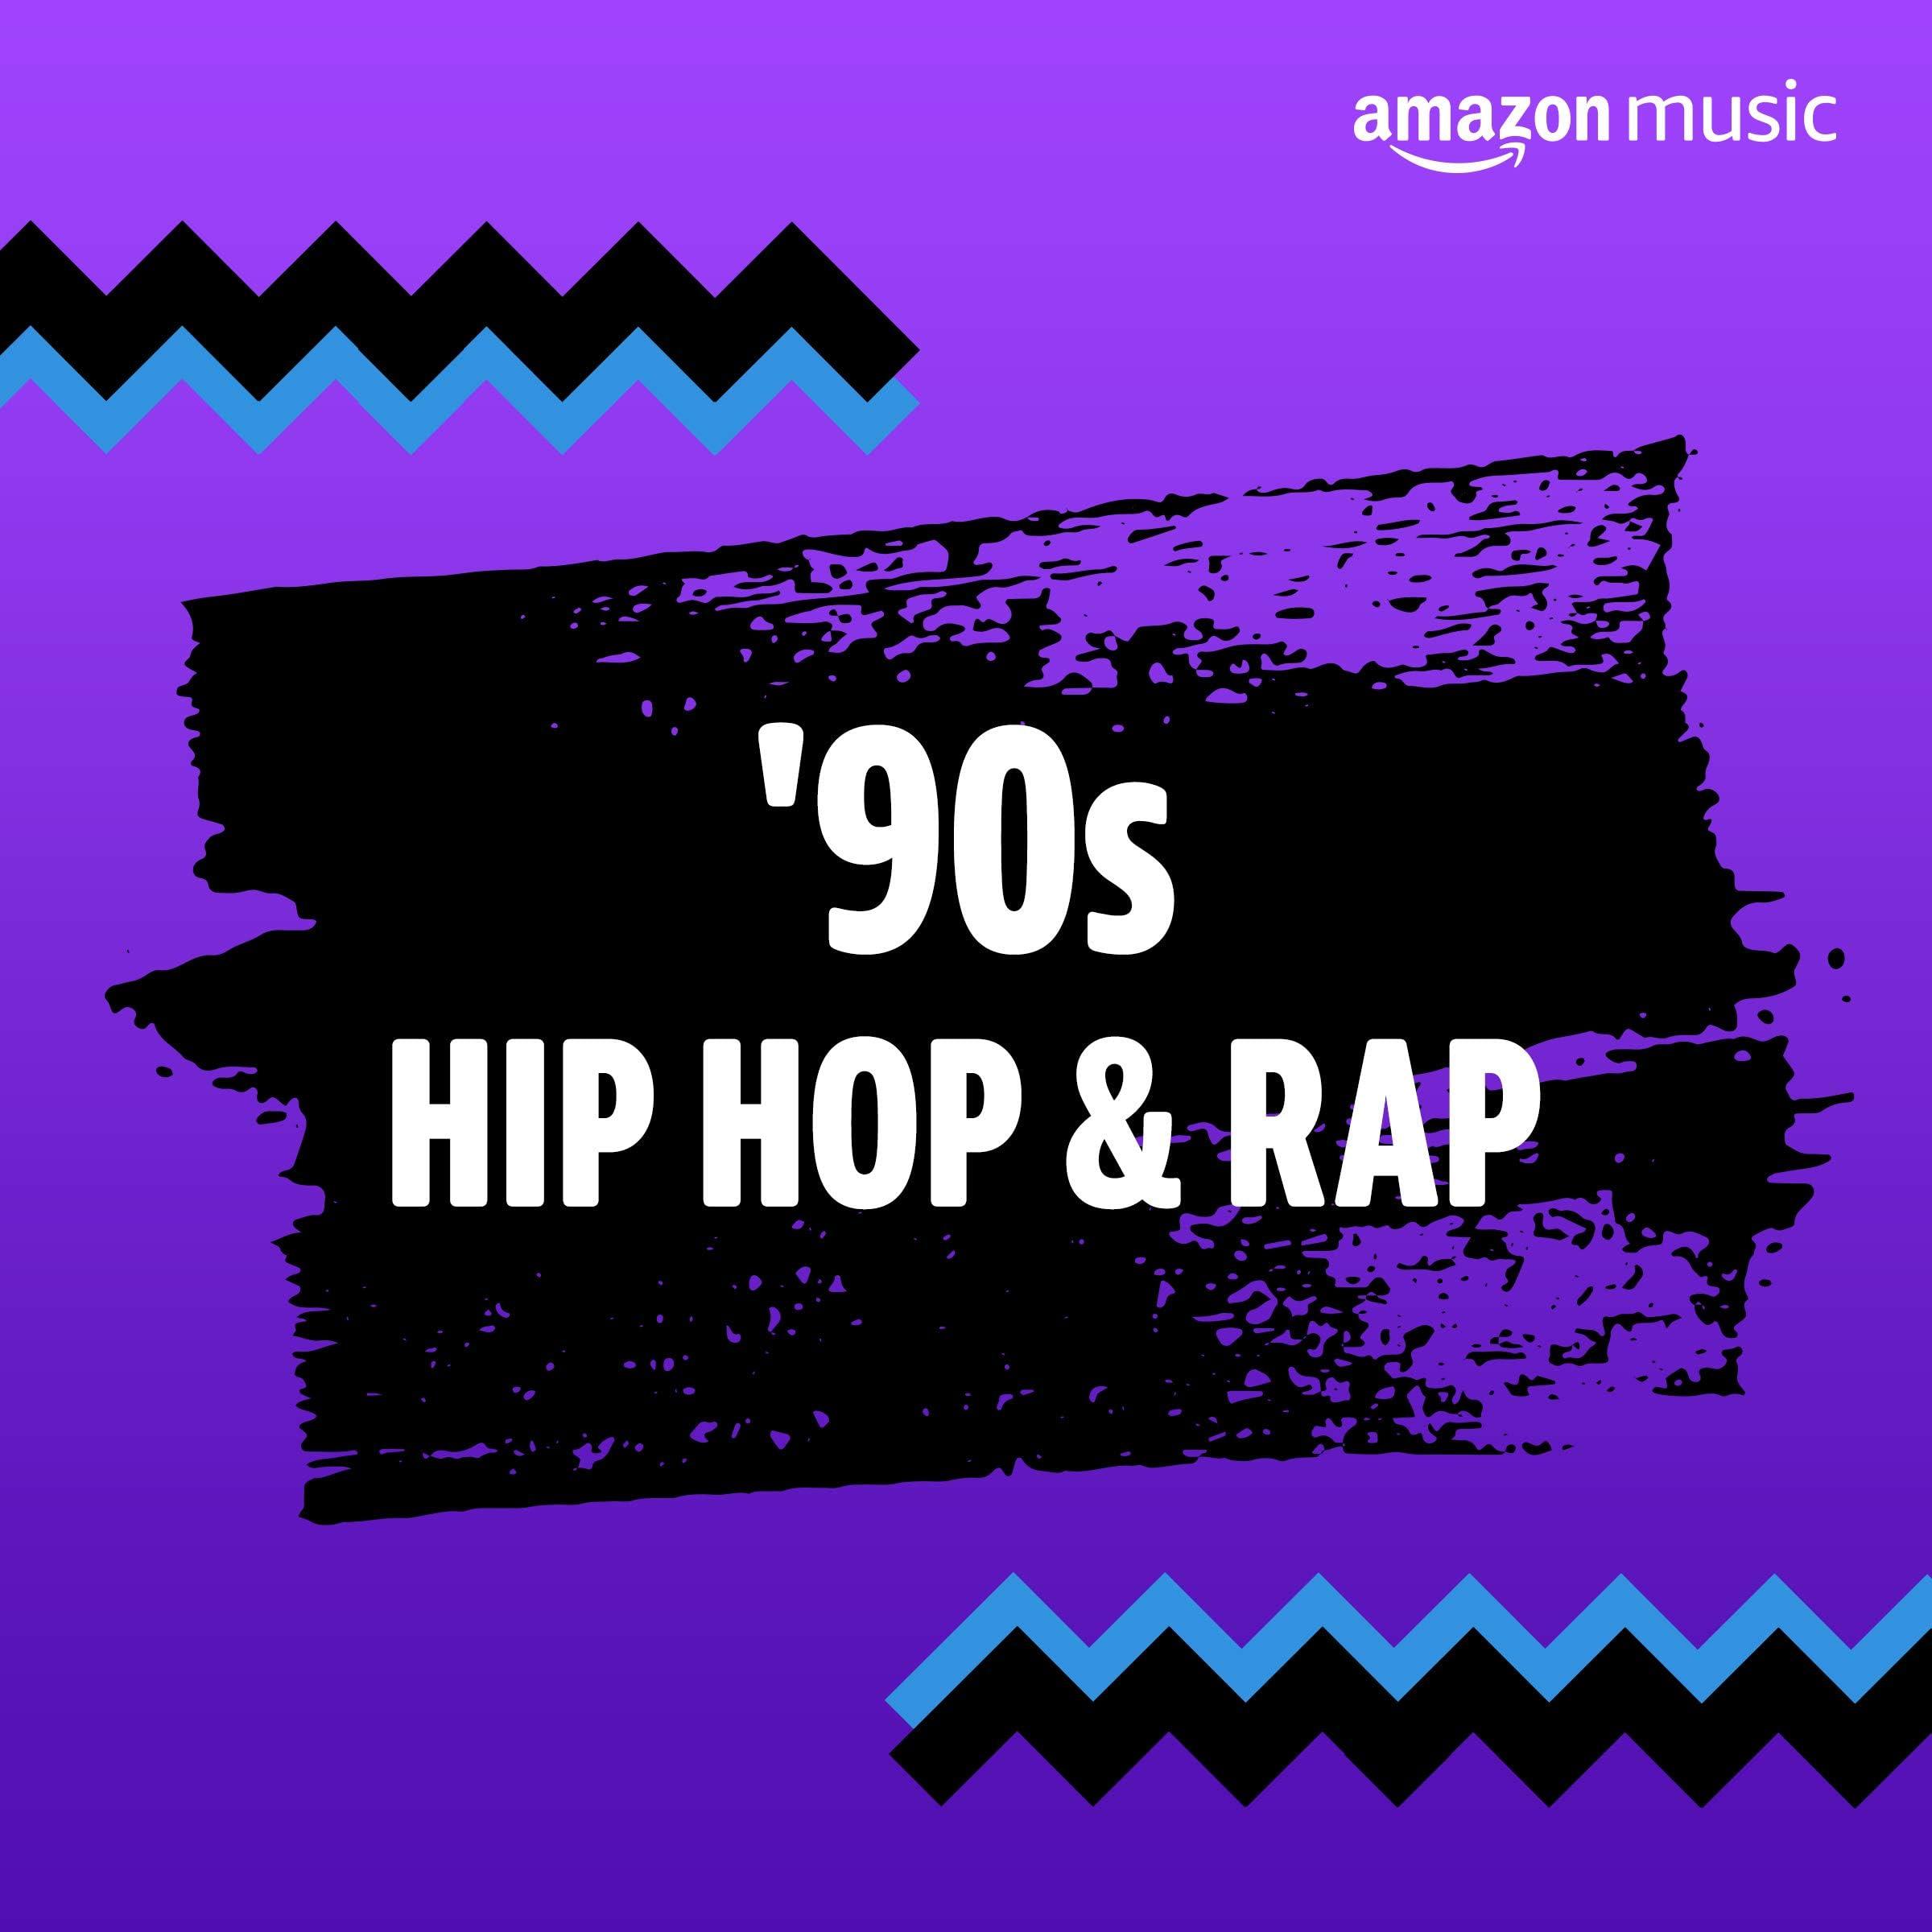 '90s West Coast Hip-Hop